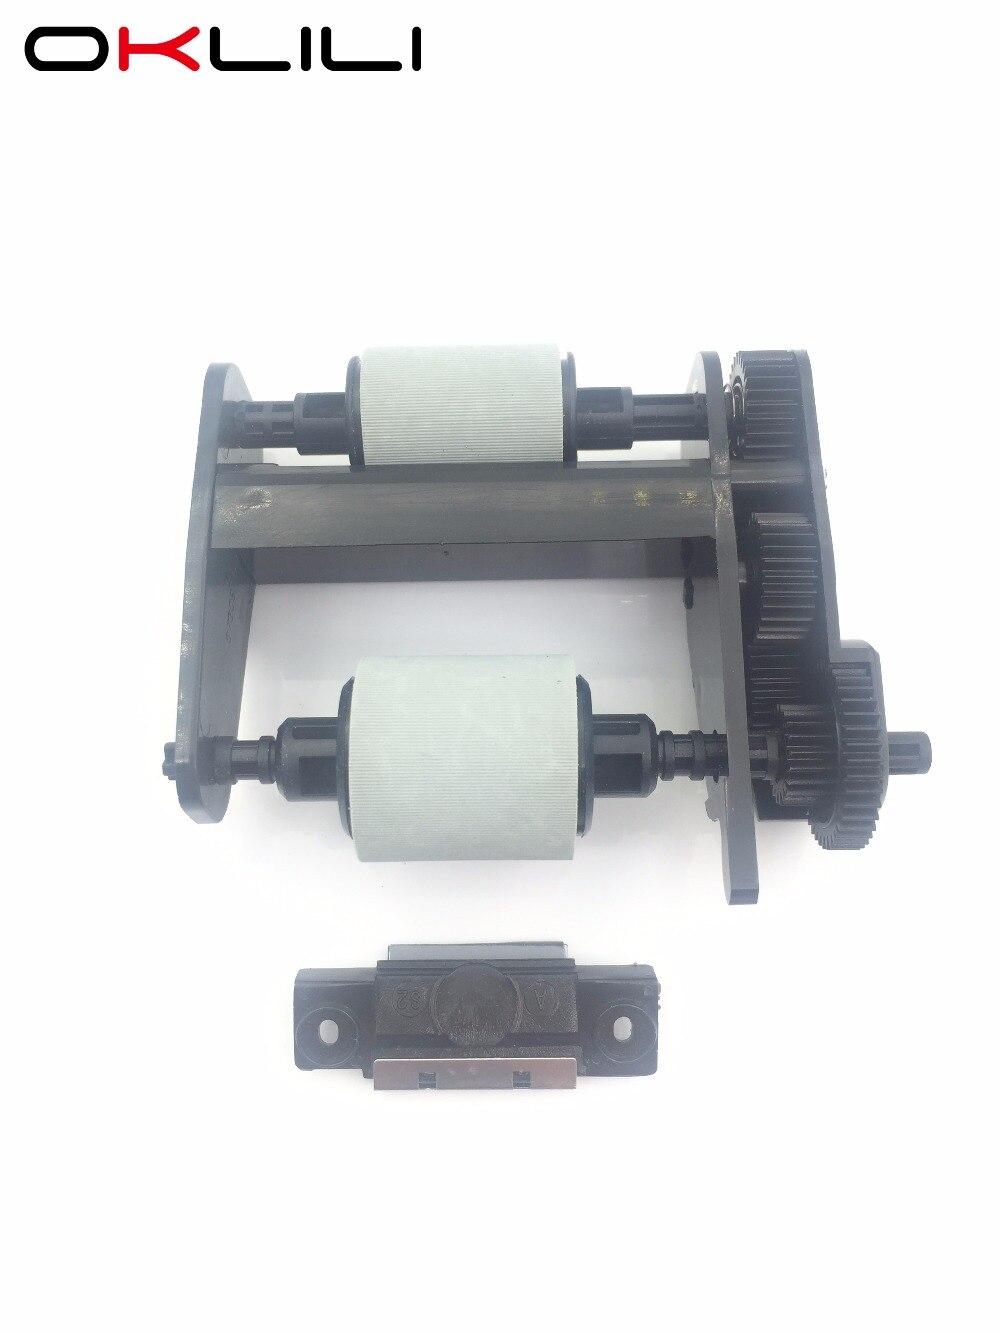 1SET Q3948-67904 5851-3580 ADF Pickup Roller Separation Pad for HP 3030 3300 3310 3320 3330 3380 OfficeJet 6110 6150 L7780 5590